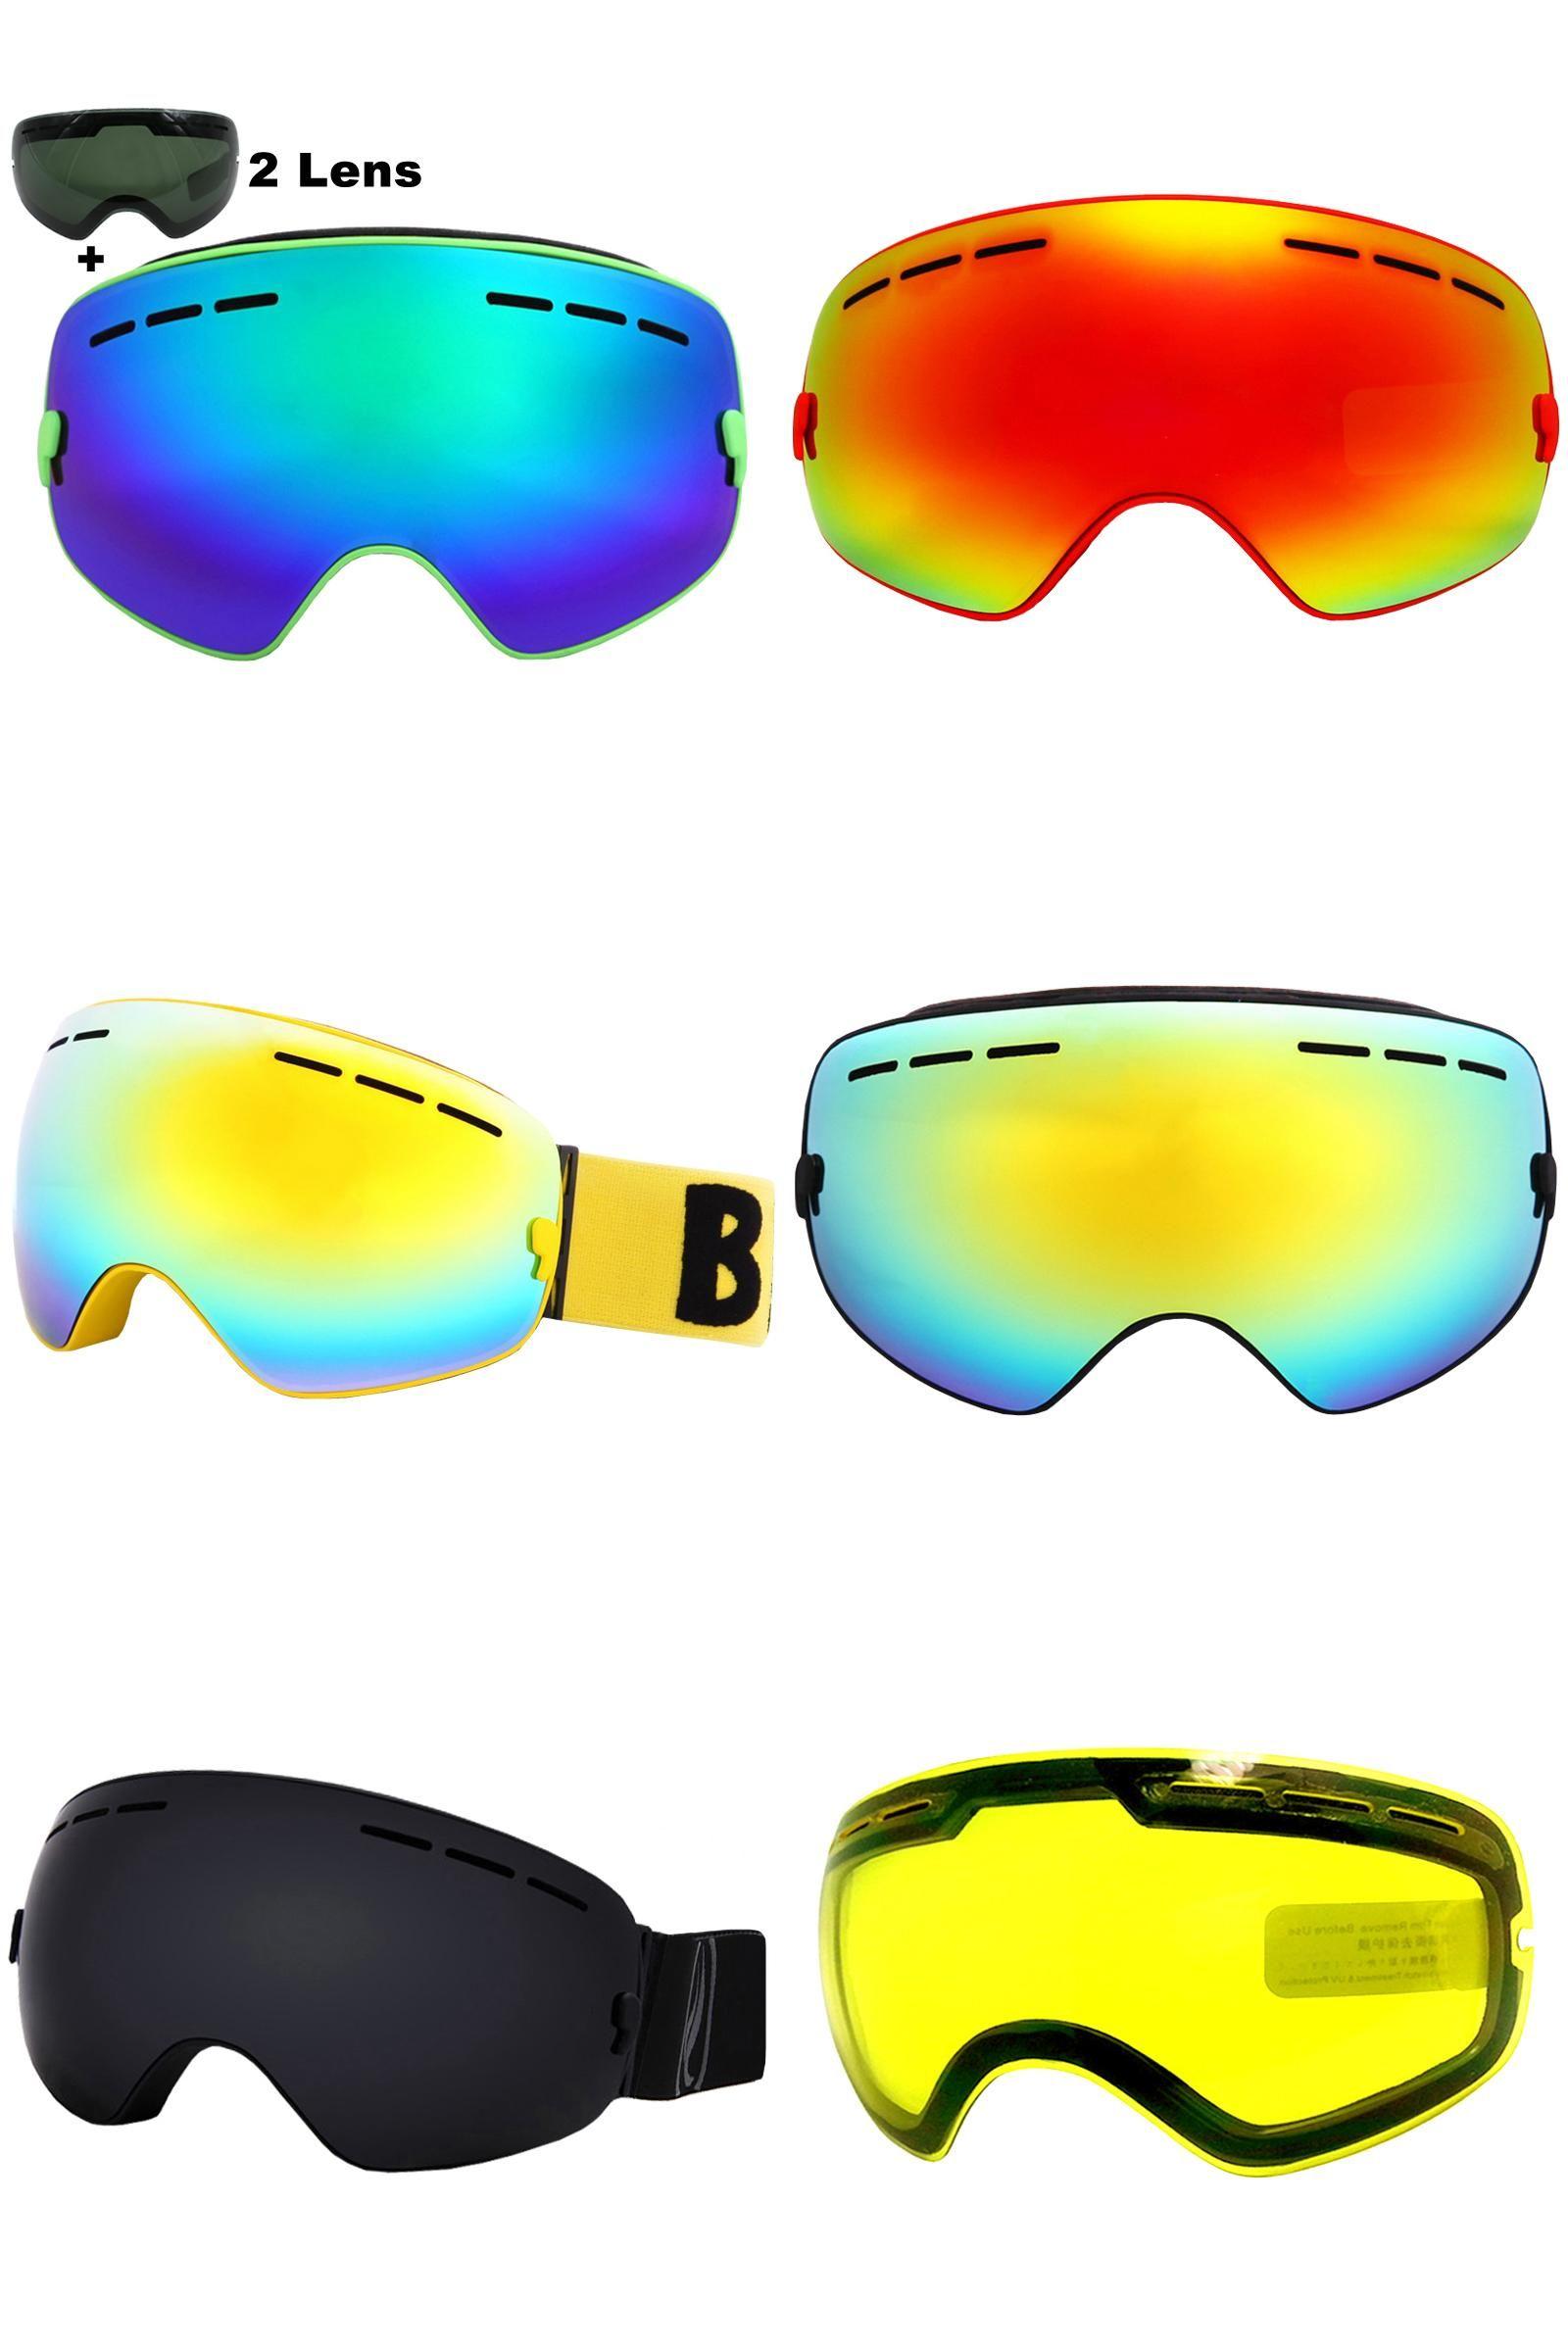 e2b851da5d3  Visit to Buy  Brand Ski Goggles Double Lens UV400 Anti-fog Large Spherical